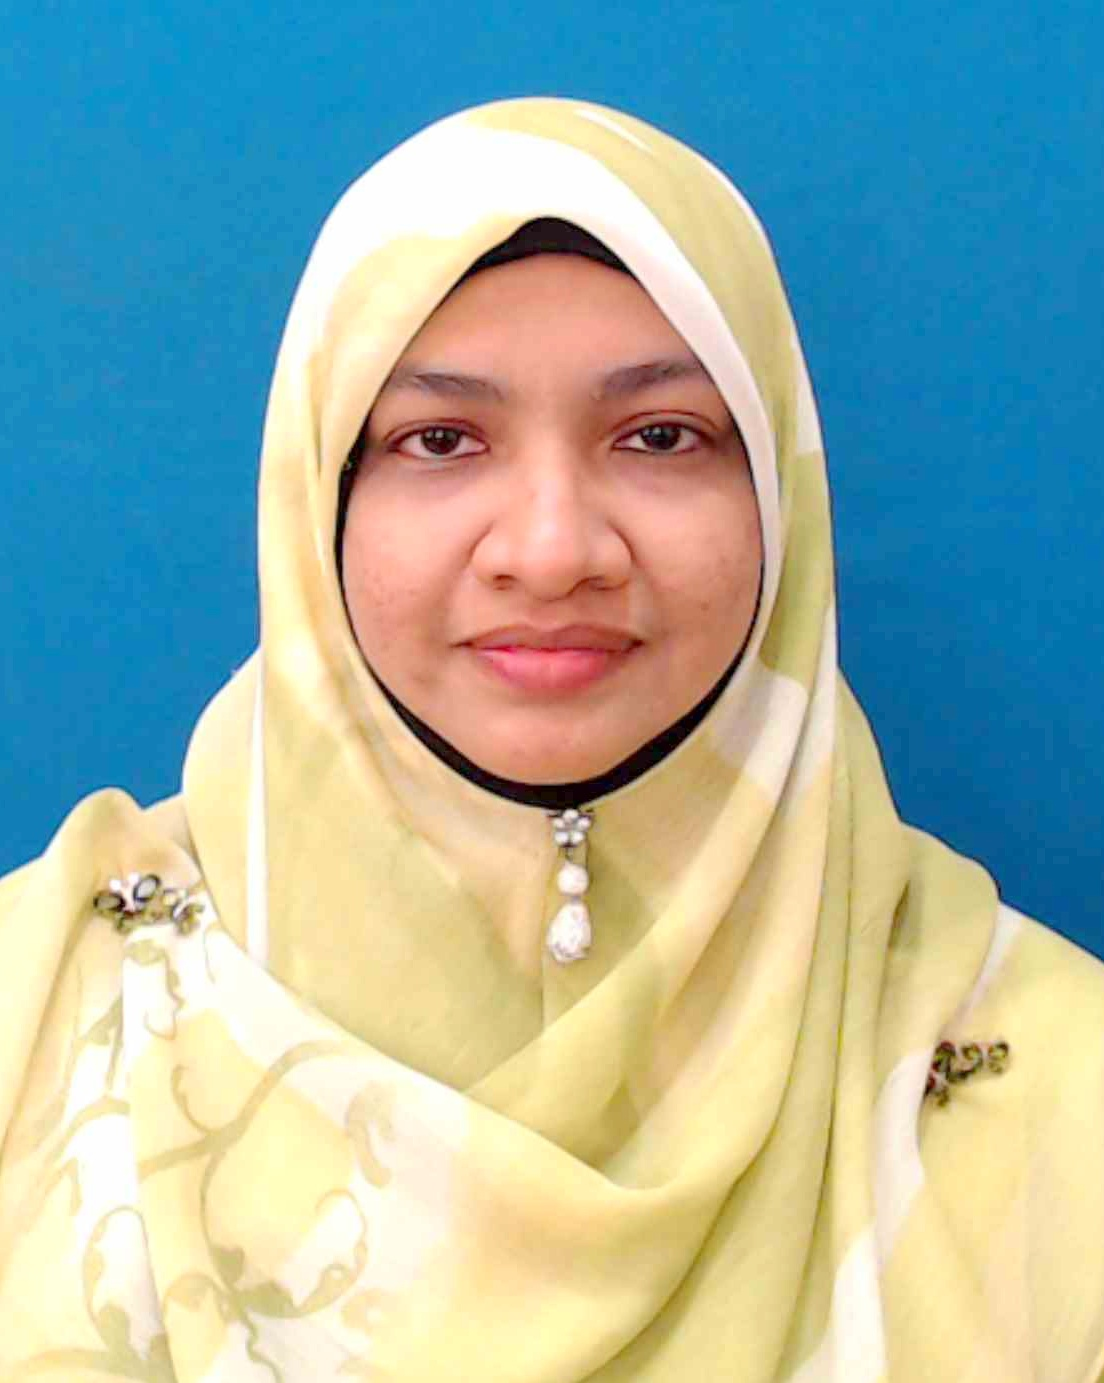 Roslina Binti Abdul Rahim